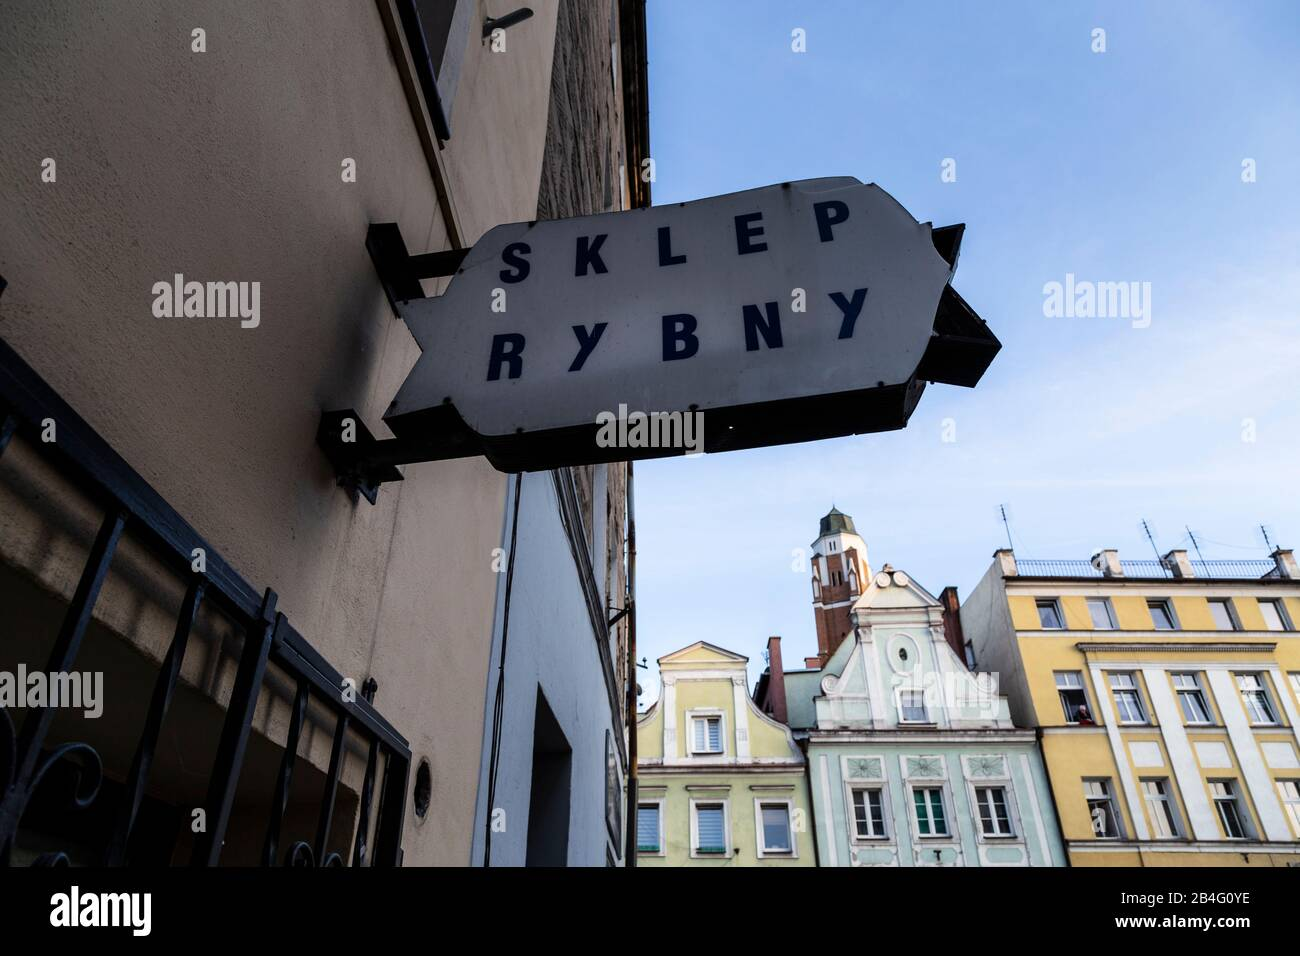 Europa, Polen, Landkreis Nysa, Provinz Opole, Paczkow/Patschkau, Rathaus und Innenstadt Stockfoto